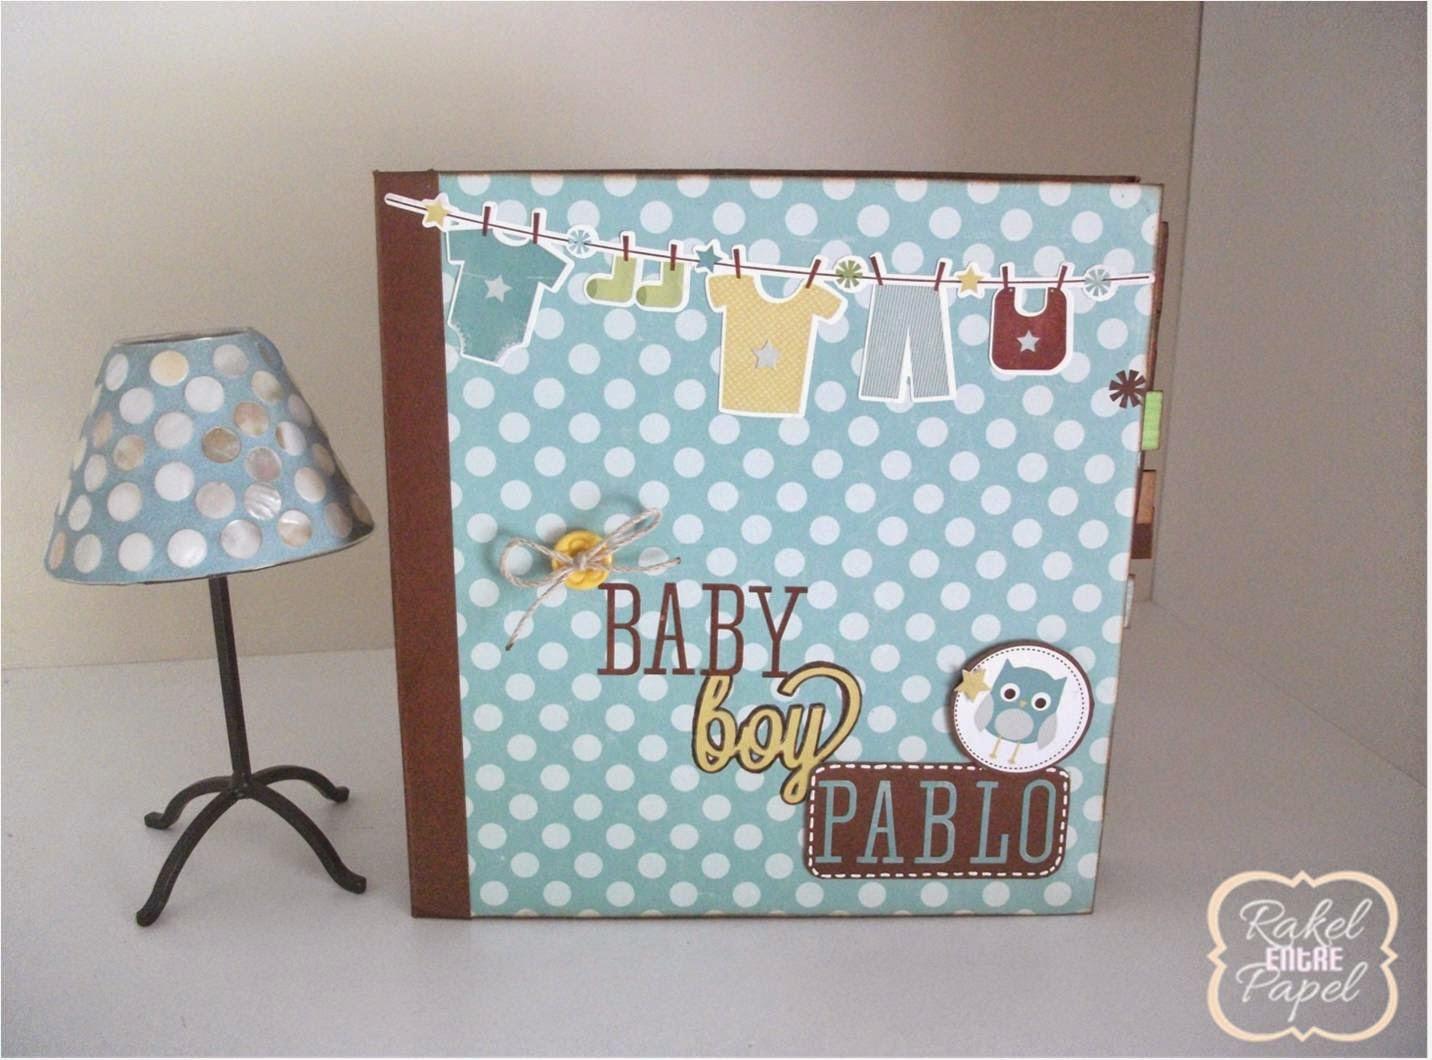 raquel entre papel mini album bebe para pablo. Black Bedroom Furniture Sets. Home Design Ideas